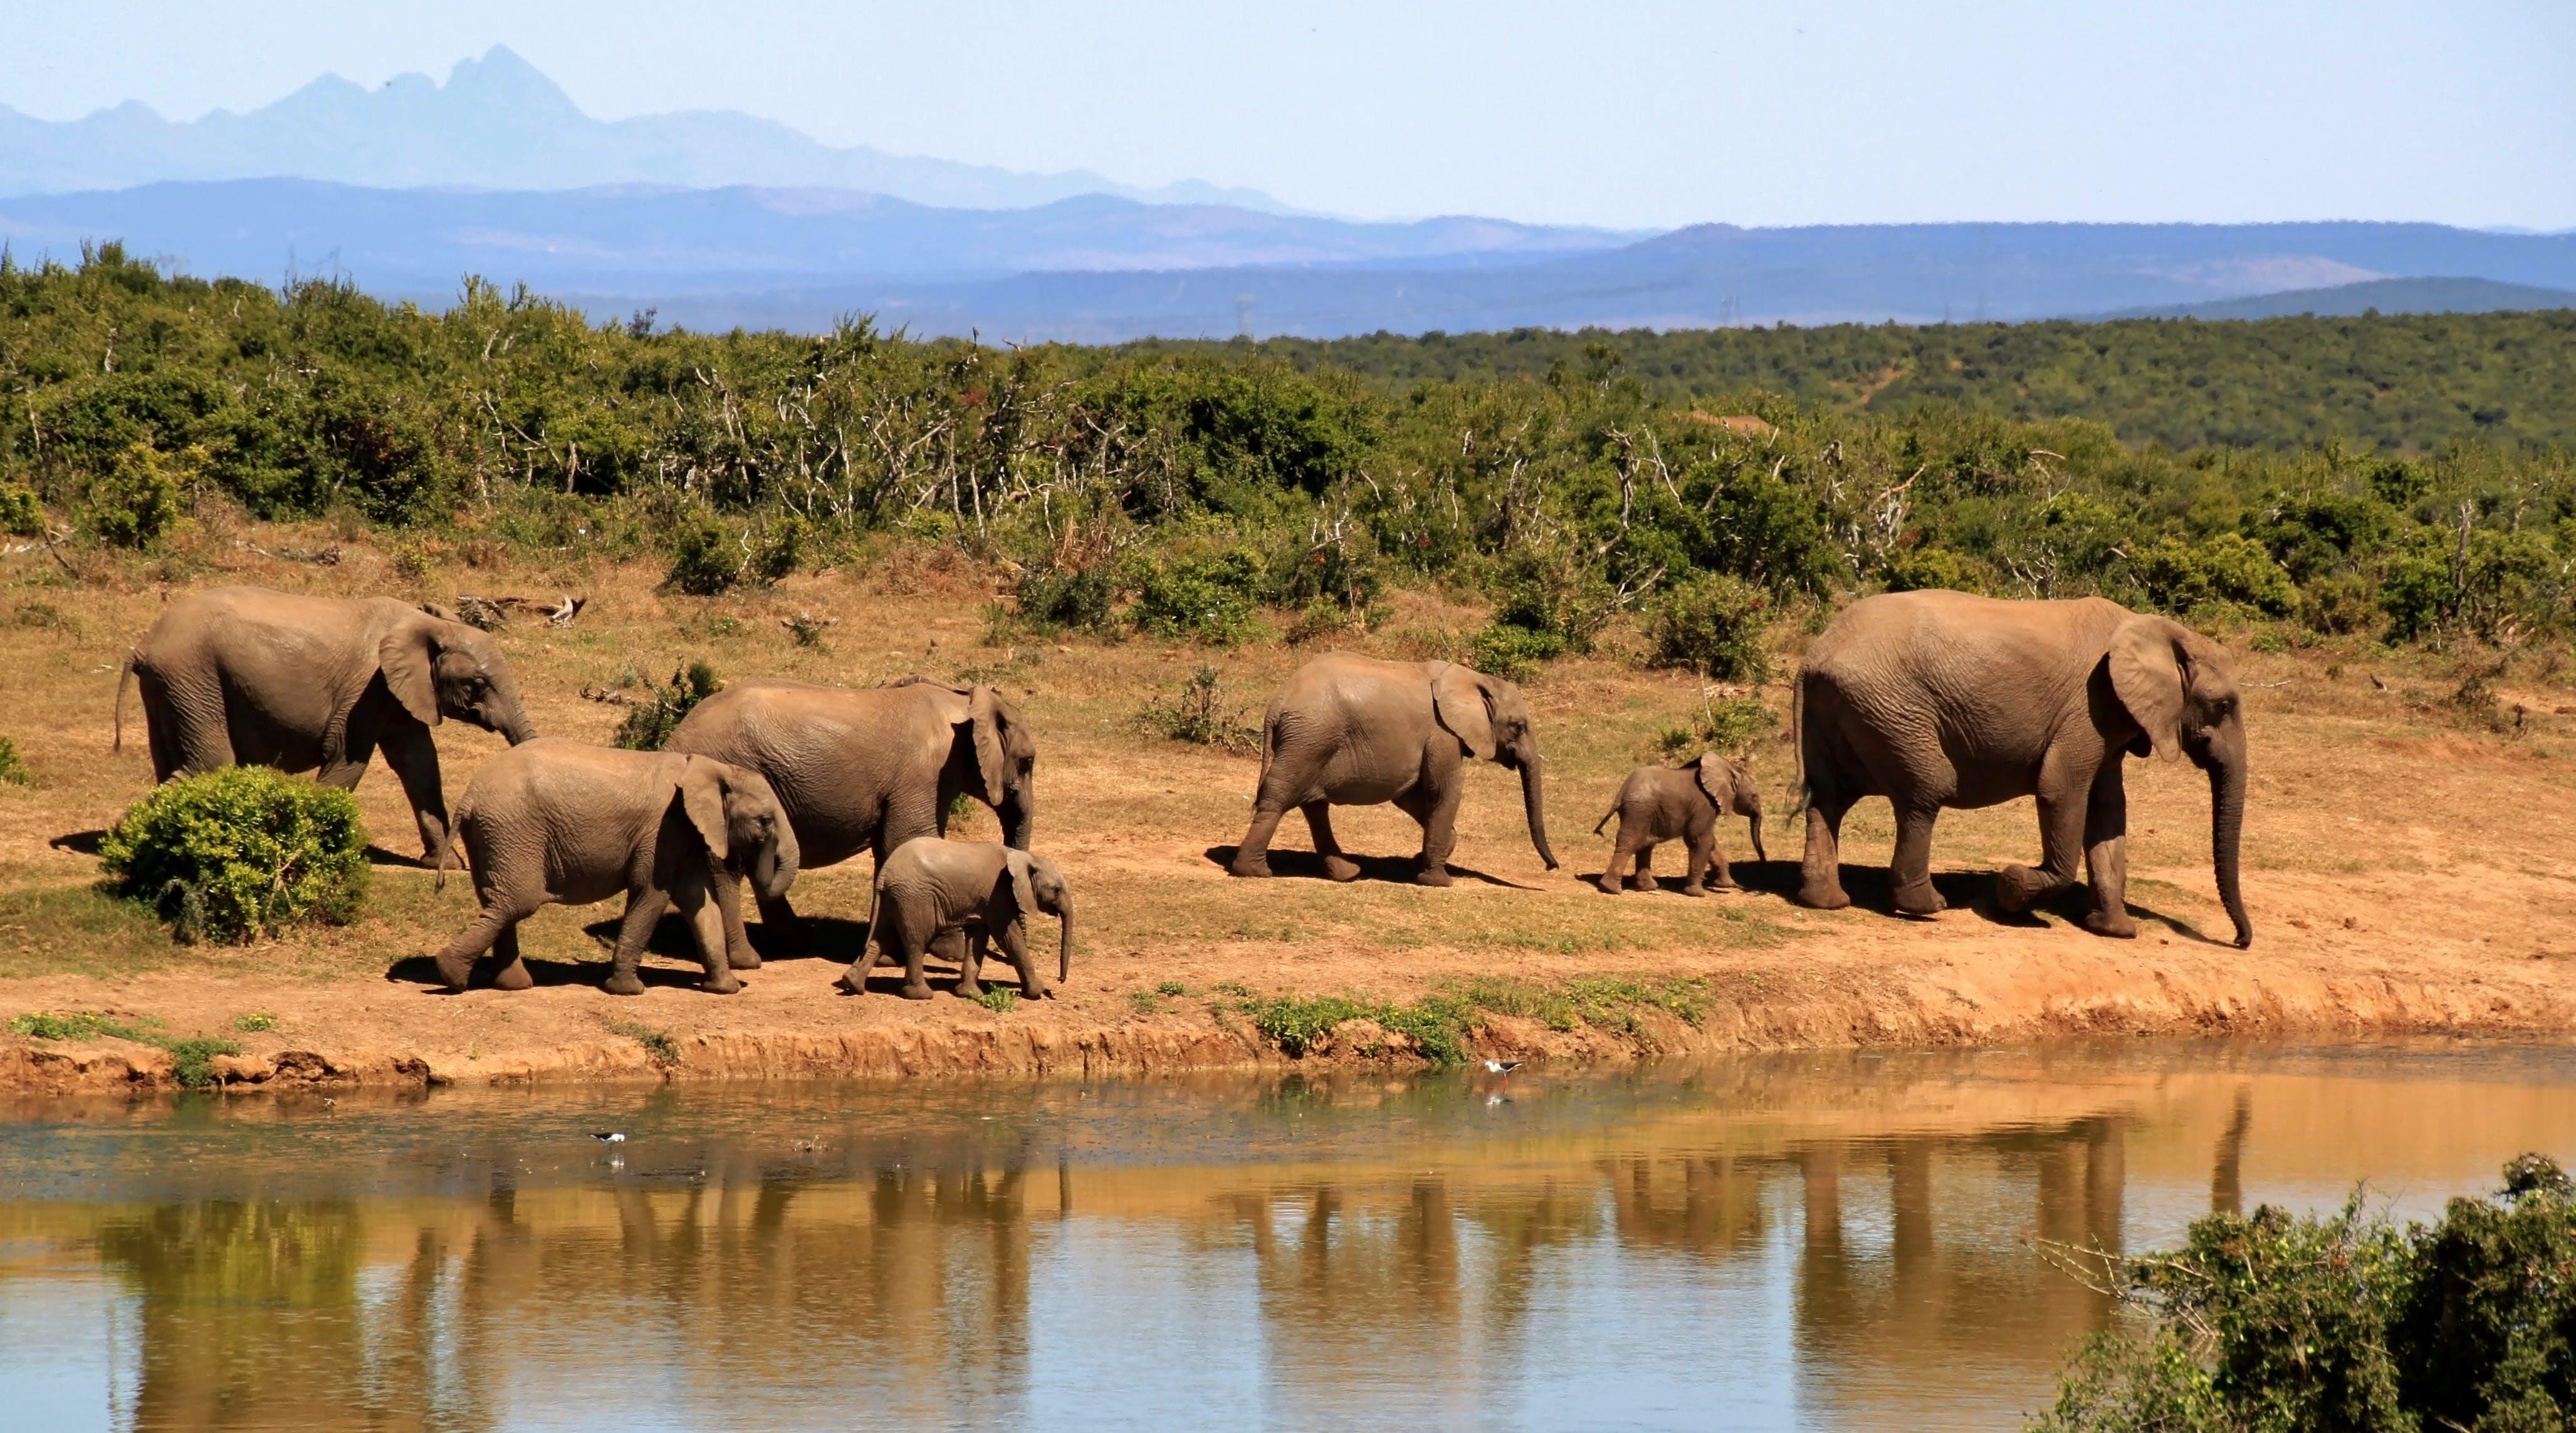 7 Elephants Walking Beside Body of Water during Daytime